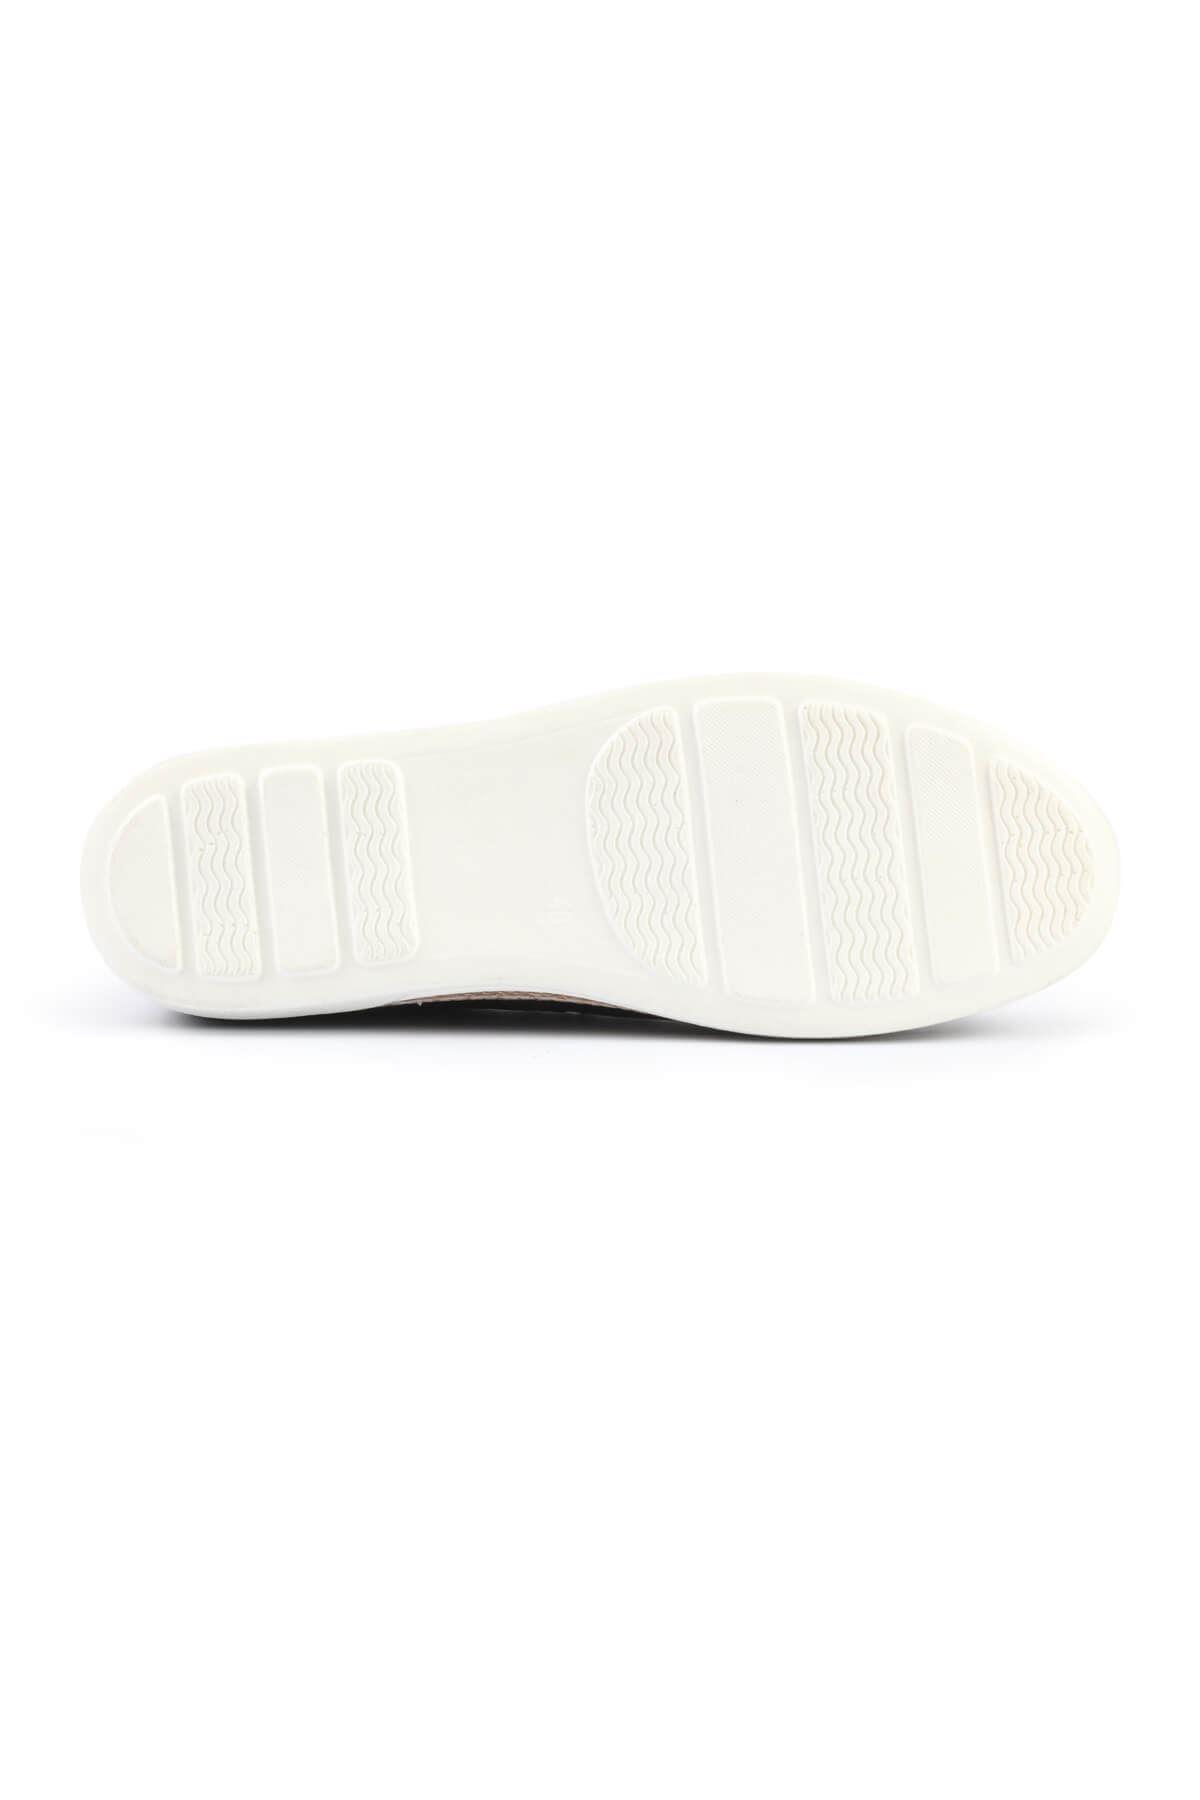 Libero C625 Lacivert Loafer Ayakkabı